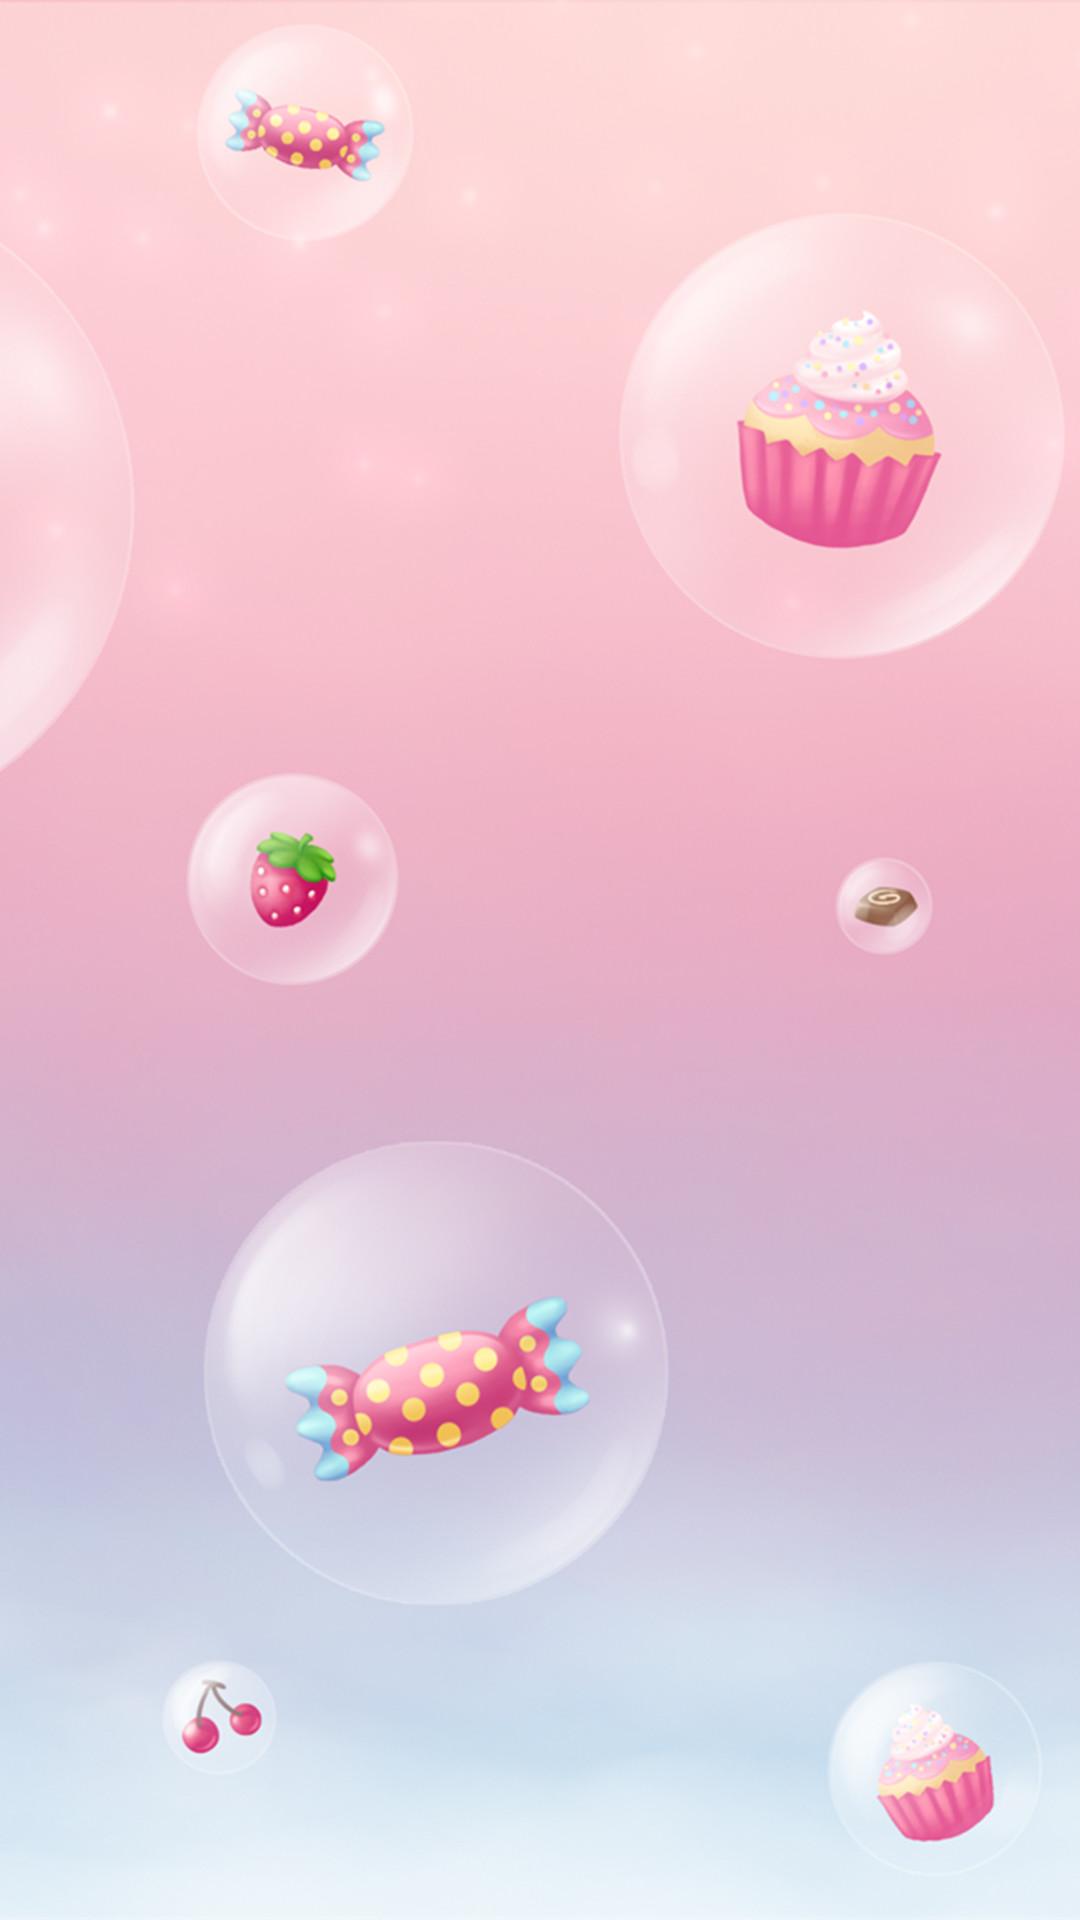 Girly cute iPhone6s wallpaper : cupcakes